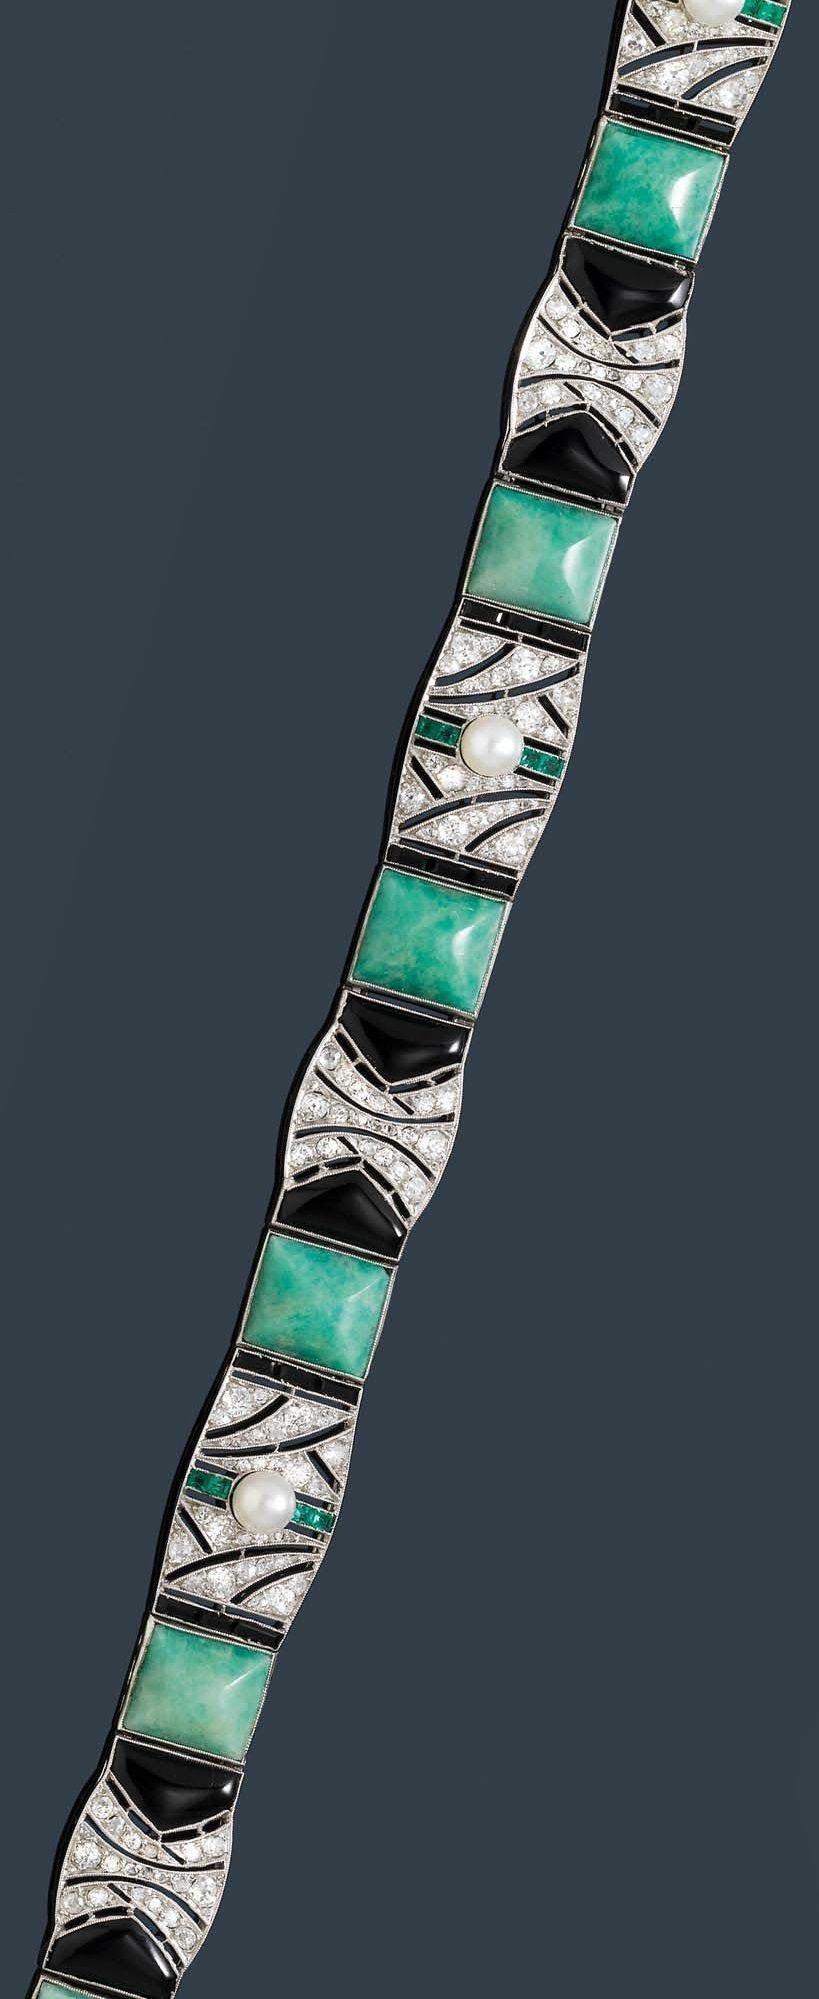 JANESICH - AN ART DECO PLATINUM, AMAZONITE, ONYX, PEARL AND DIAMOND BRACELET, CIRCA 1925. #Janesich #ArtDeco #bracelet